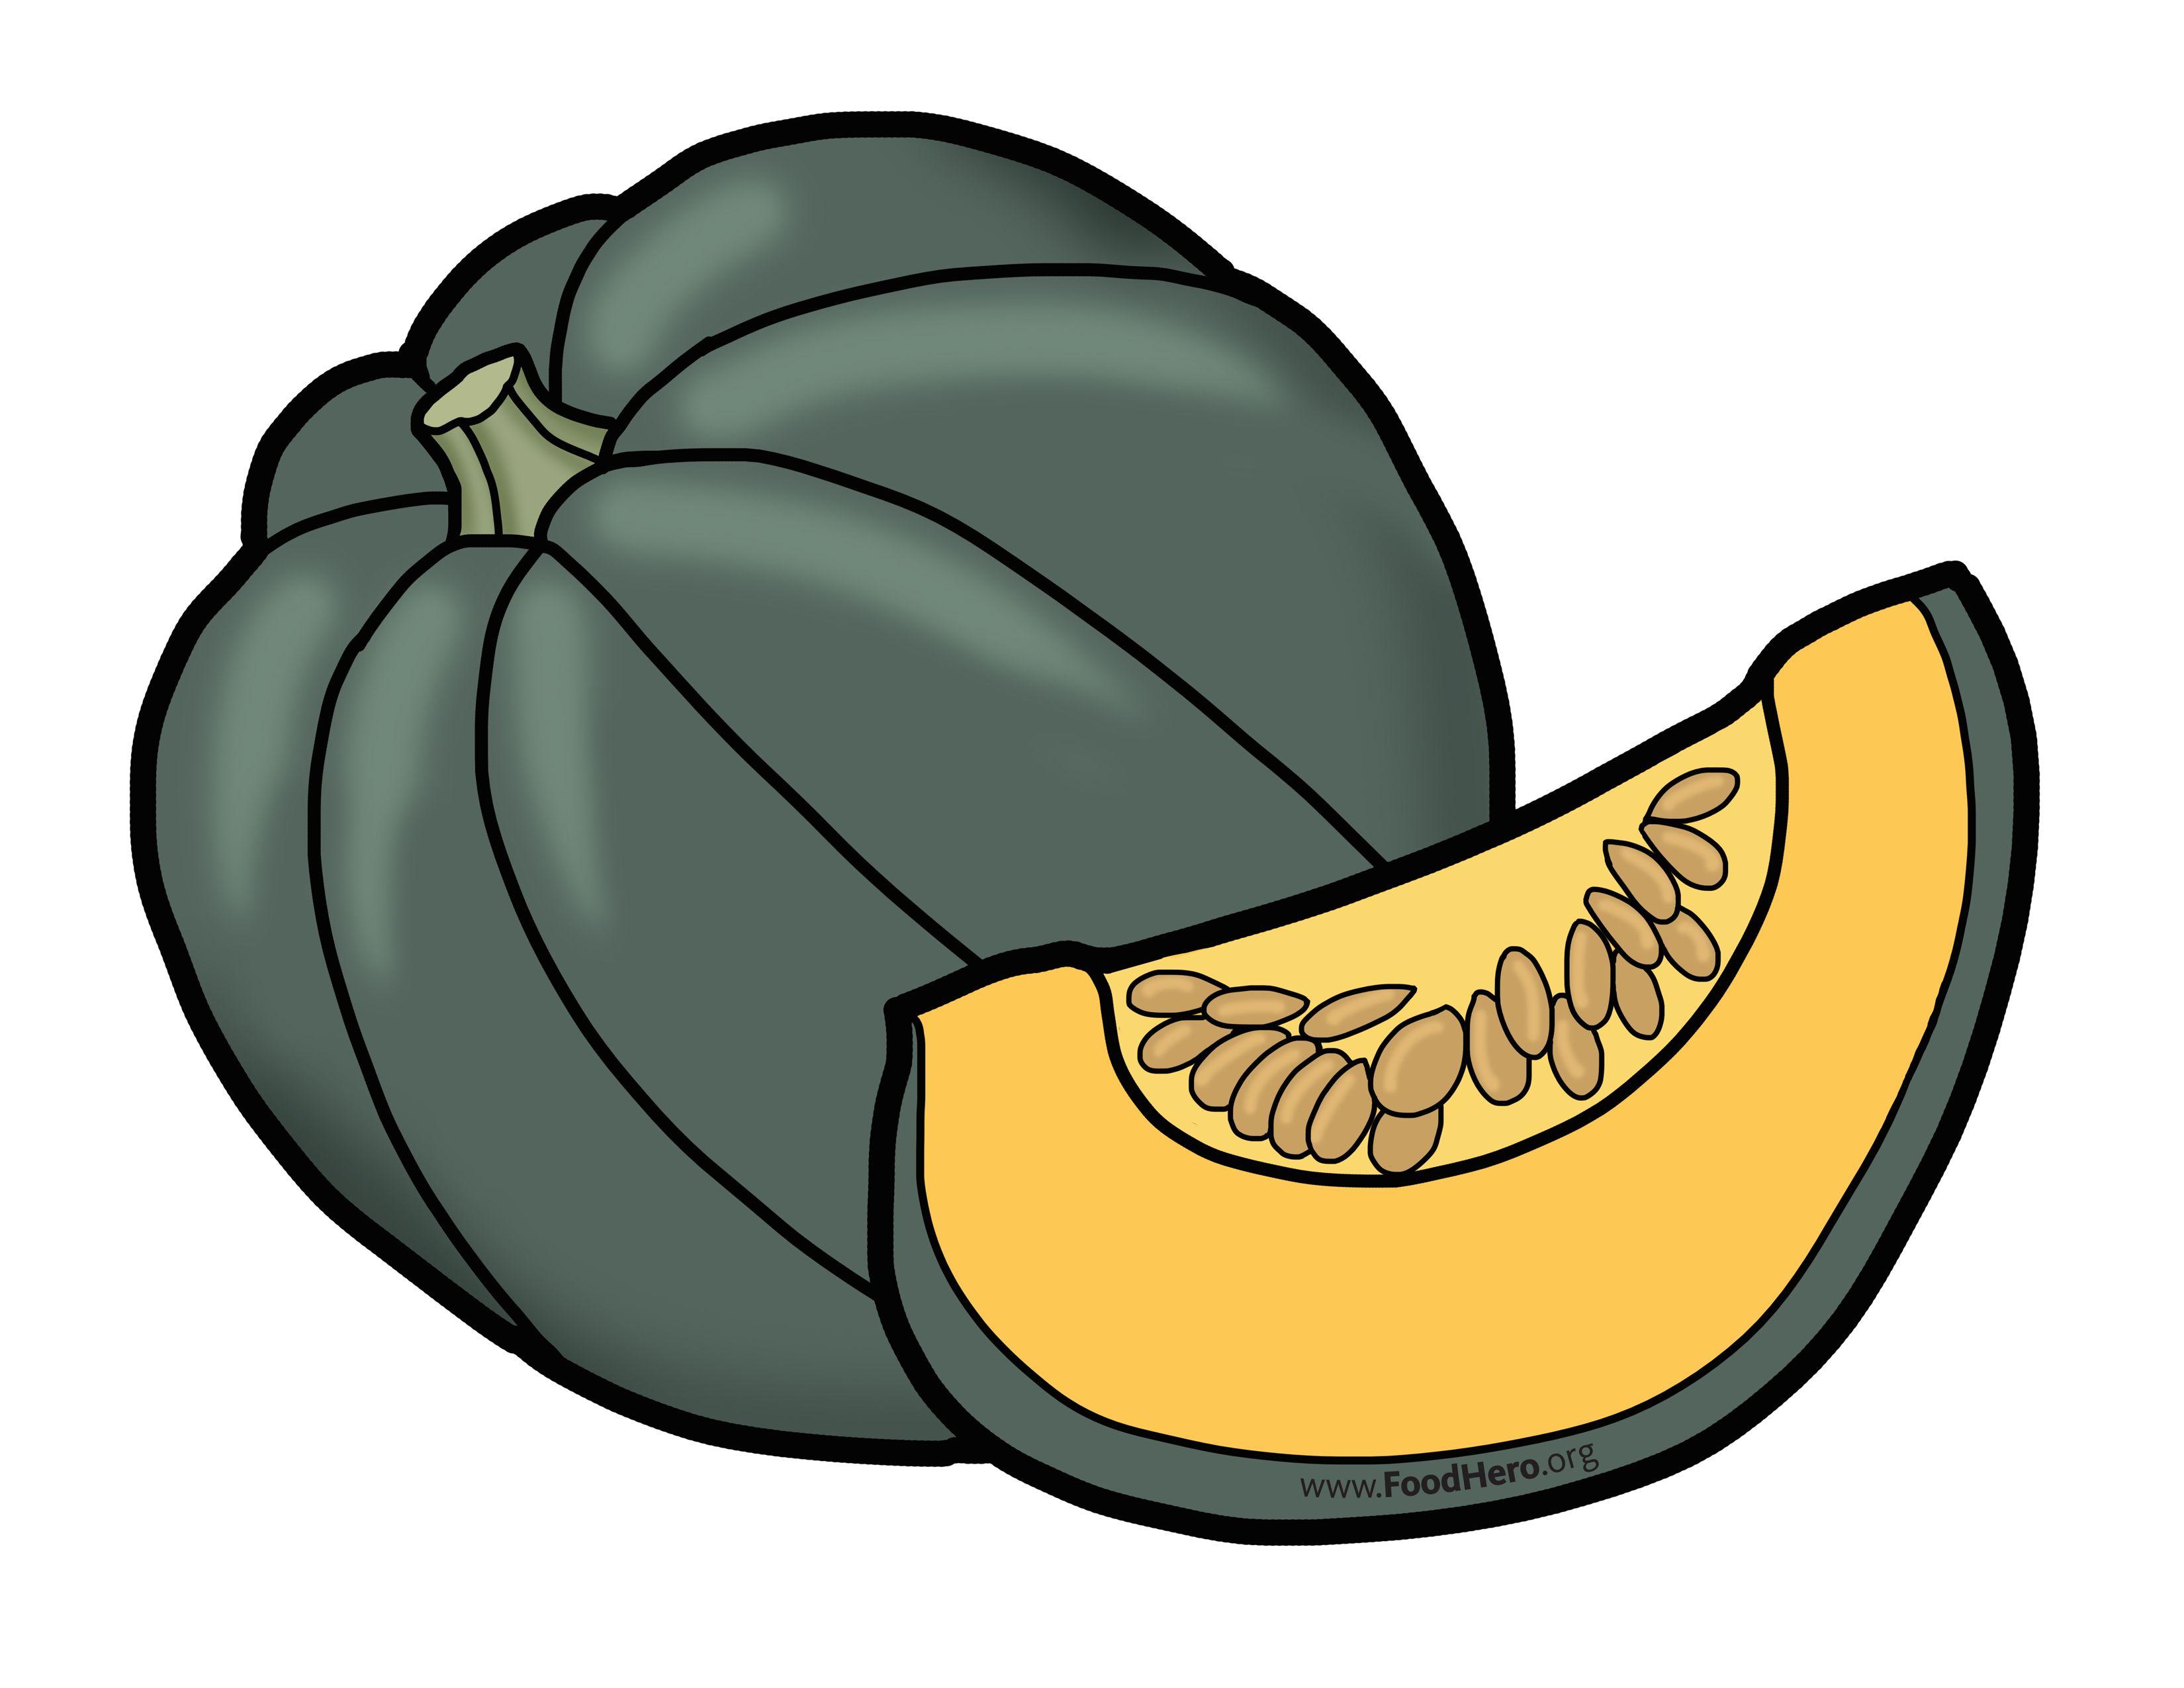 Illustration found at foodhero.org. #schoolart #acornsquash.